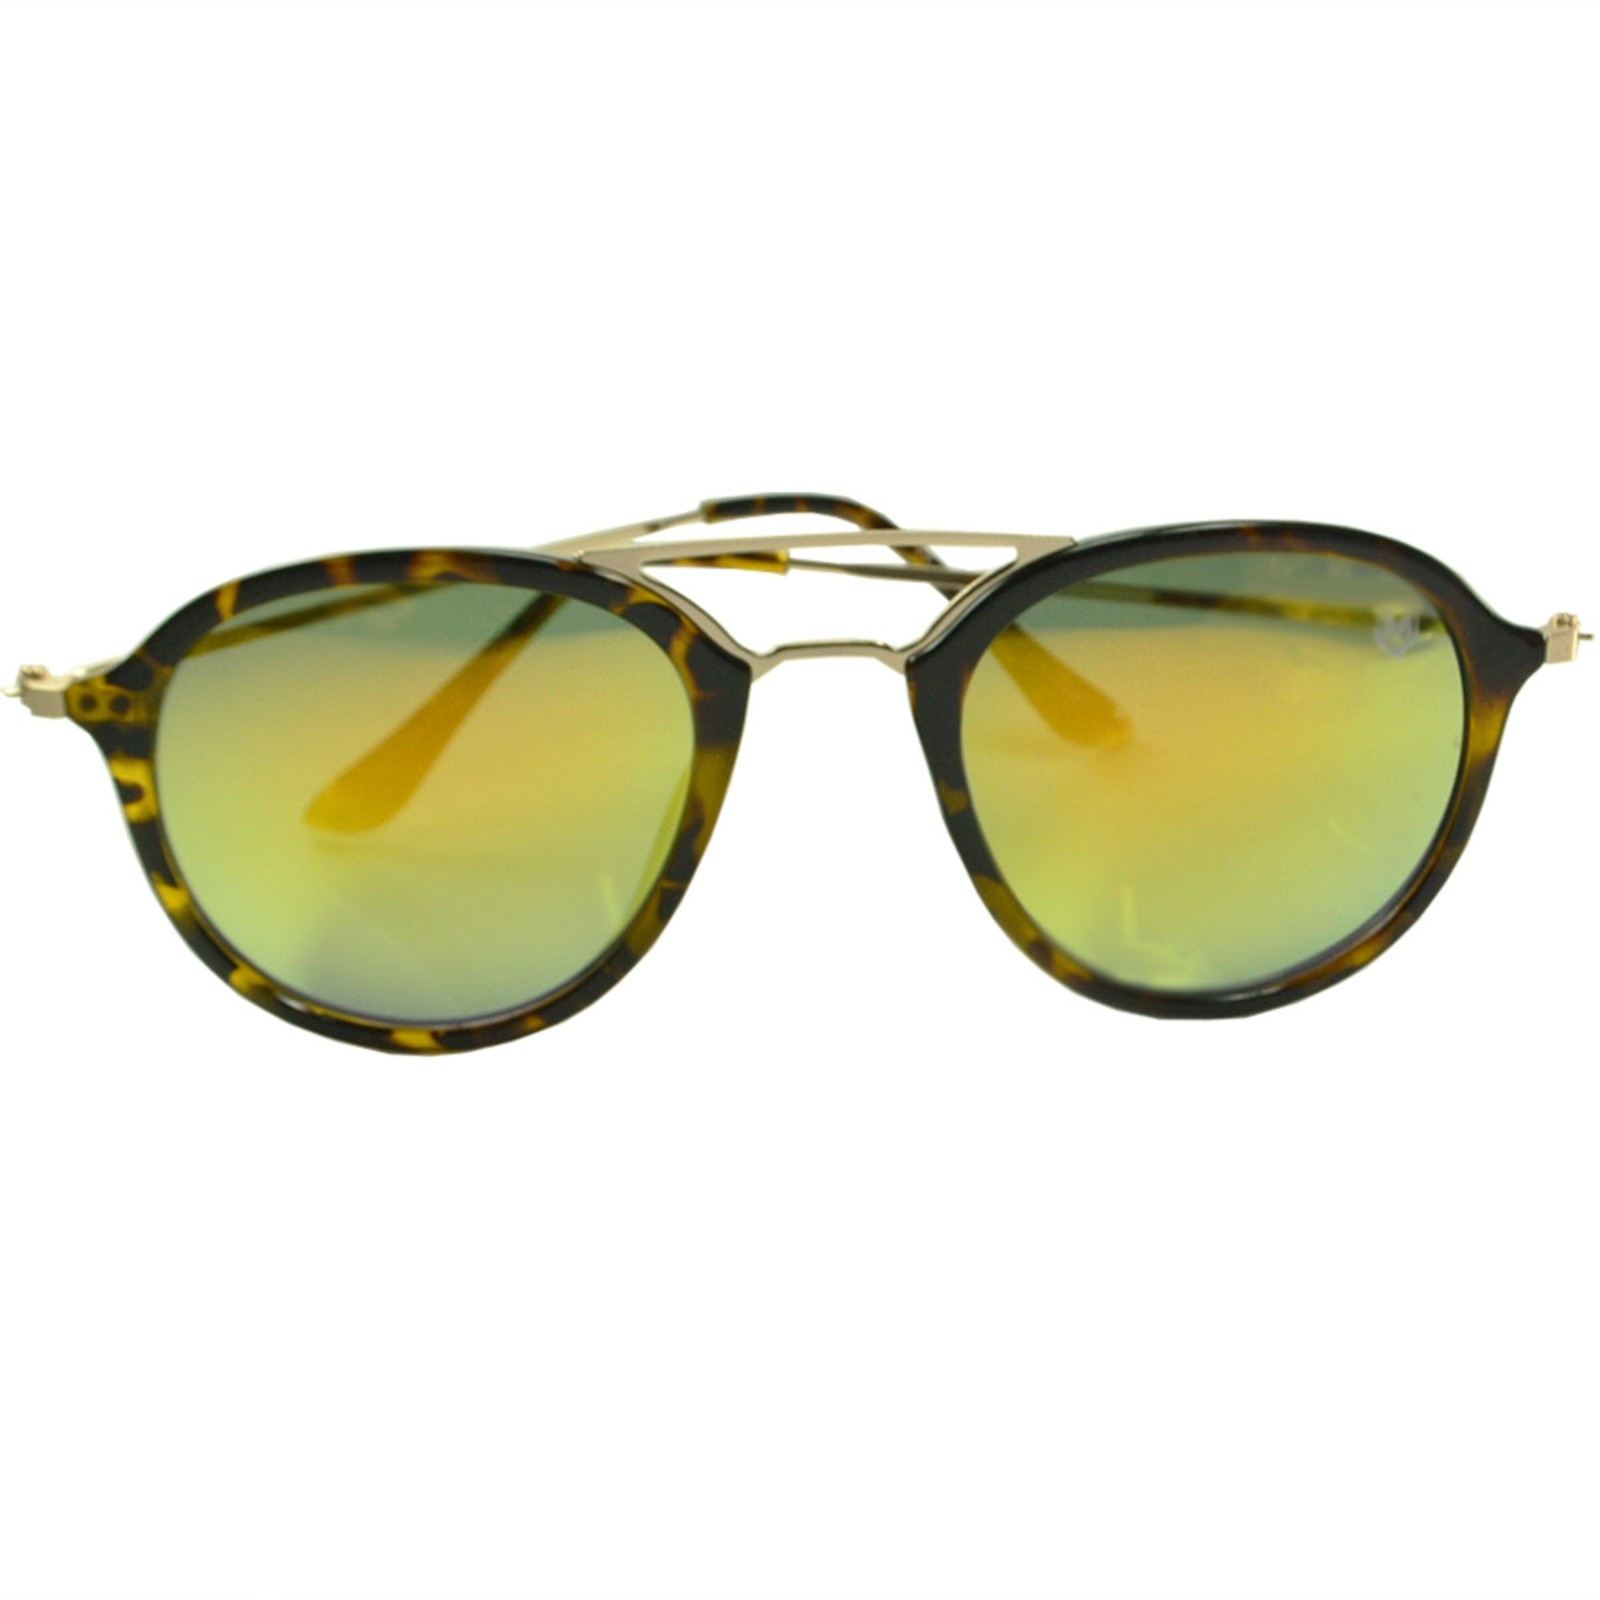 Óculos De Sol Mackage Unisex Acetato Aviator - Tarta